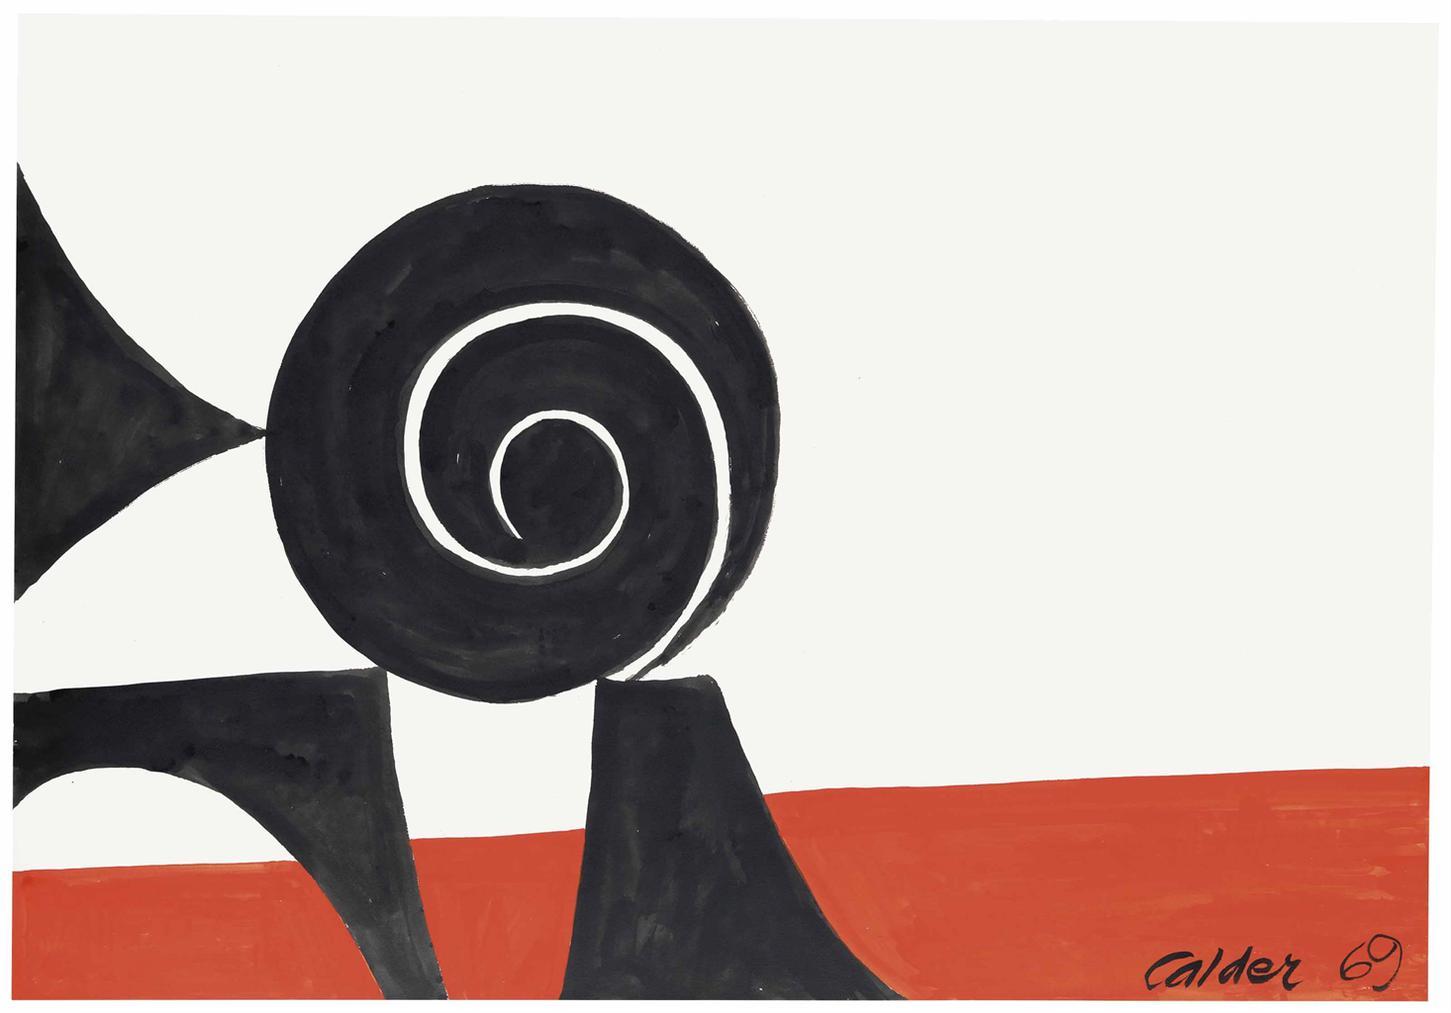 Alexander Calder-Balanced Spiral-1969